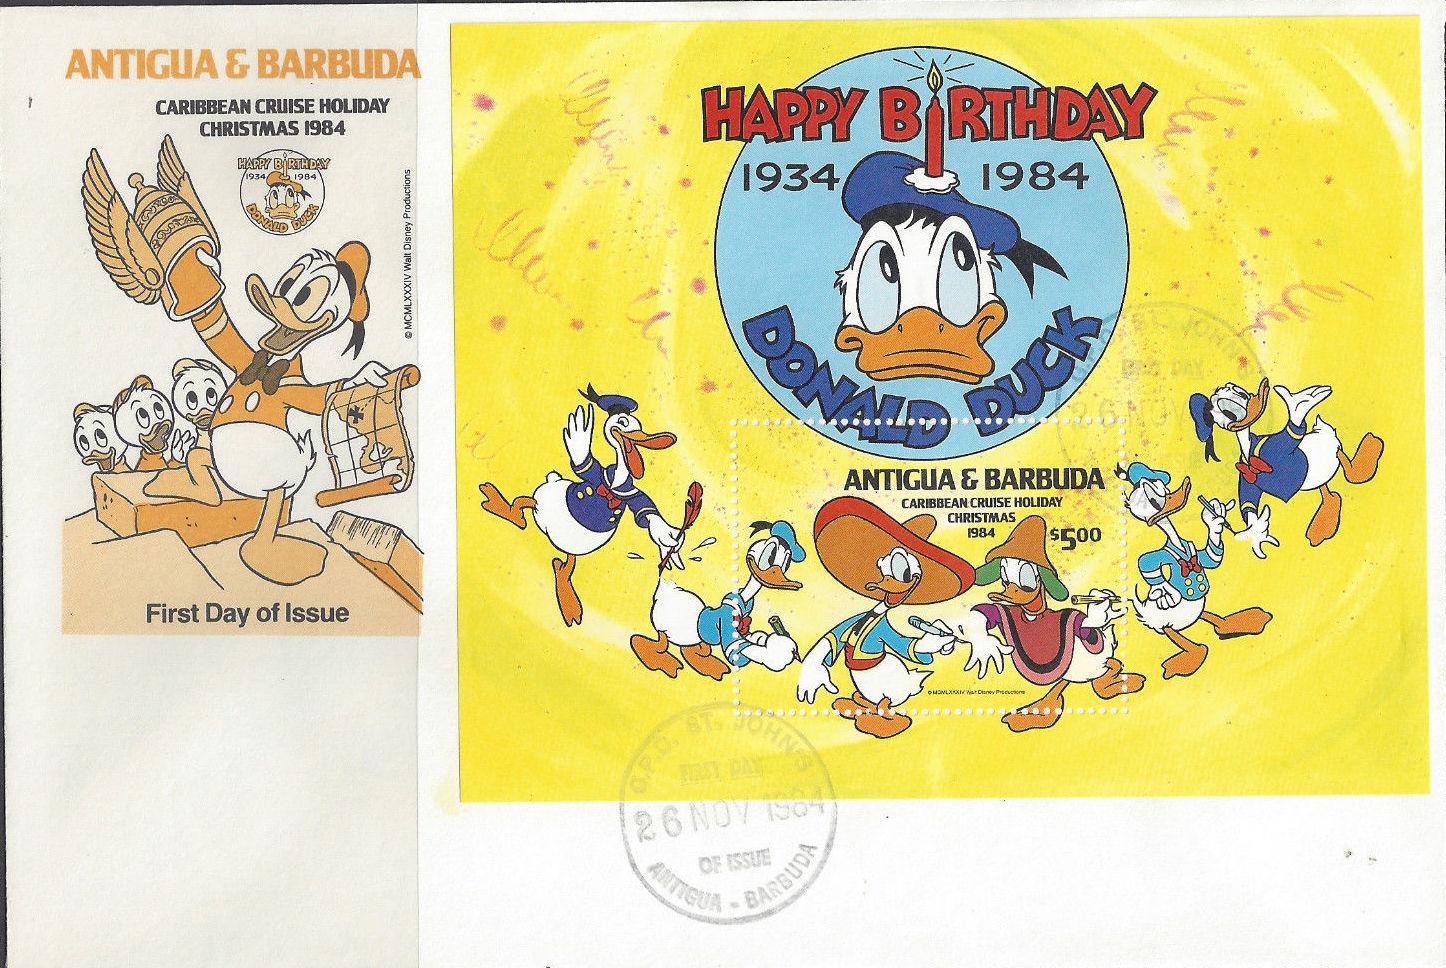 Antigua and Barbuda 1984 Disney - Christmas - 50th Anniversary of the Birth of Donald Duck p.jpg